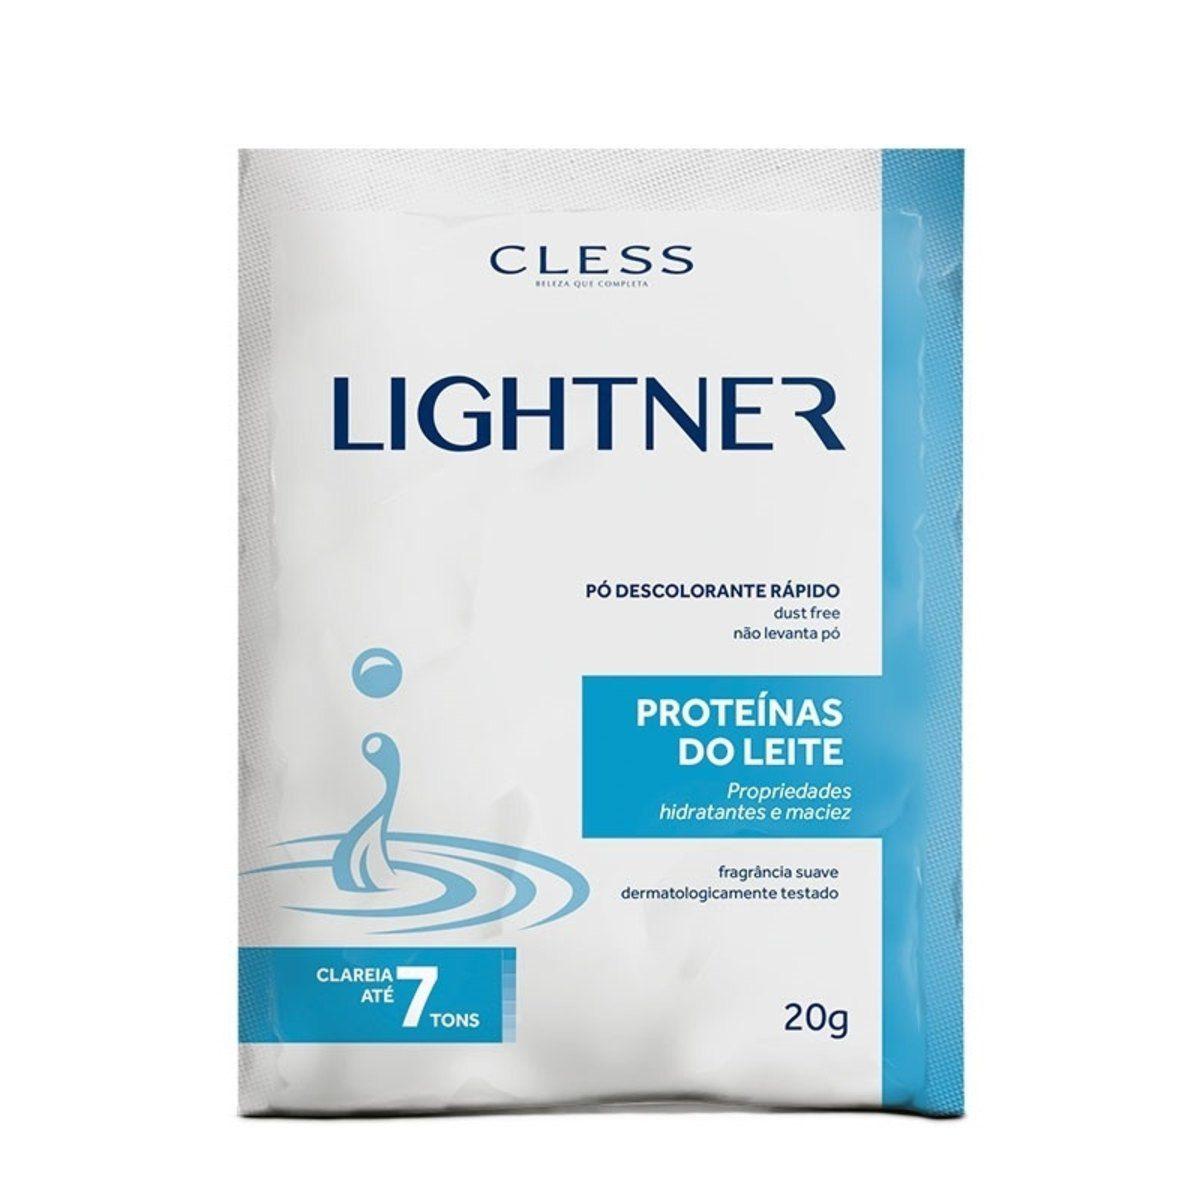 Pó Descolorante Lightner Proteina do Leite 20gr  - LUISA PERFUMARIA E COSMETICOS